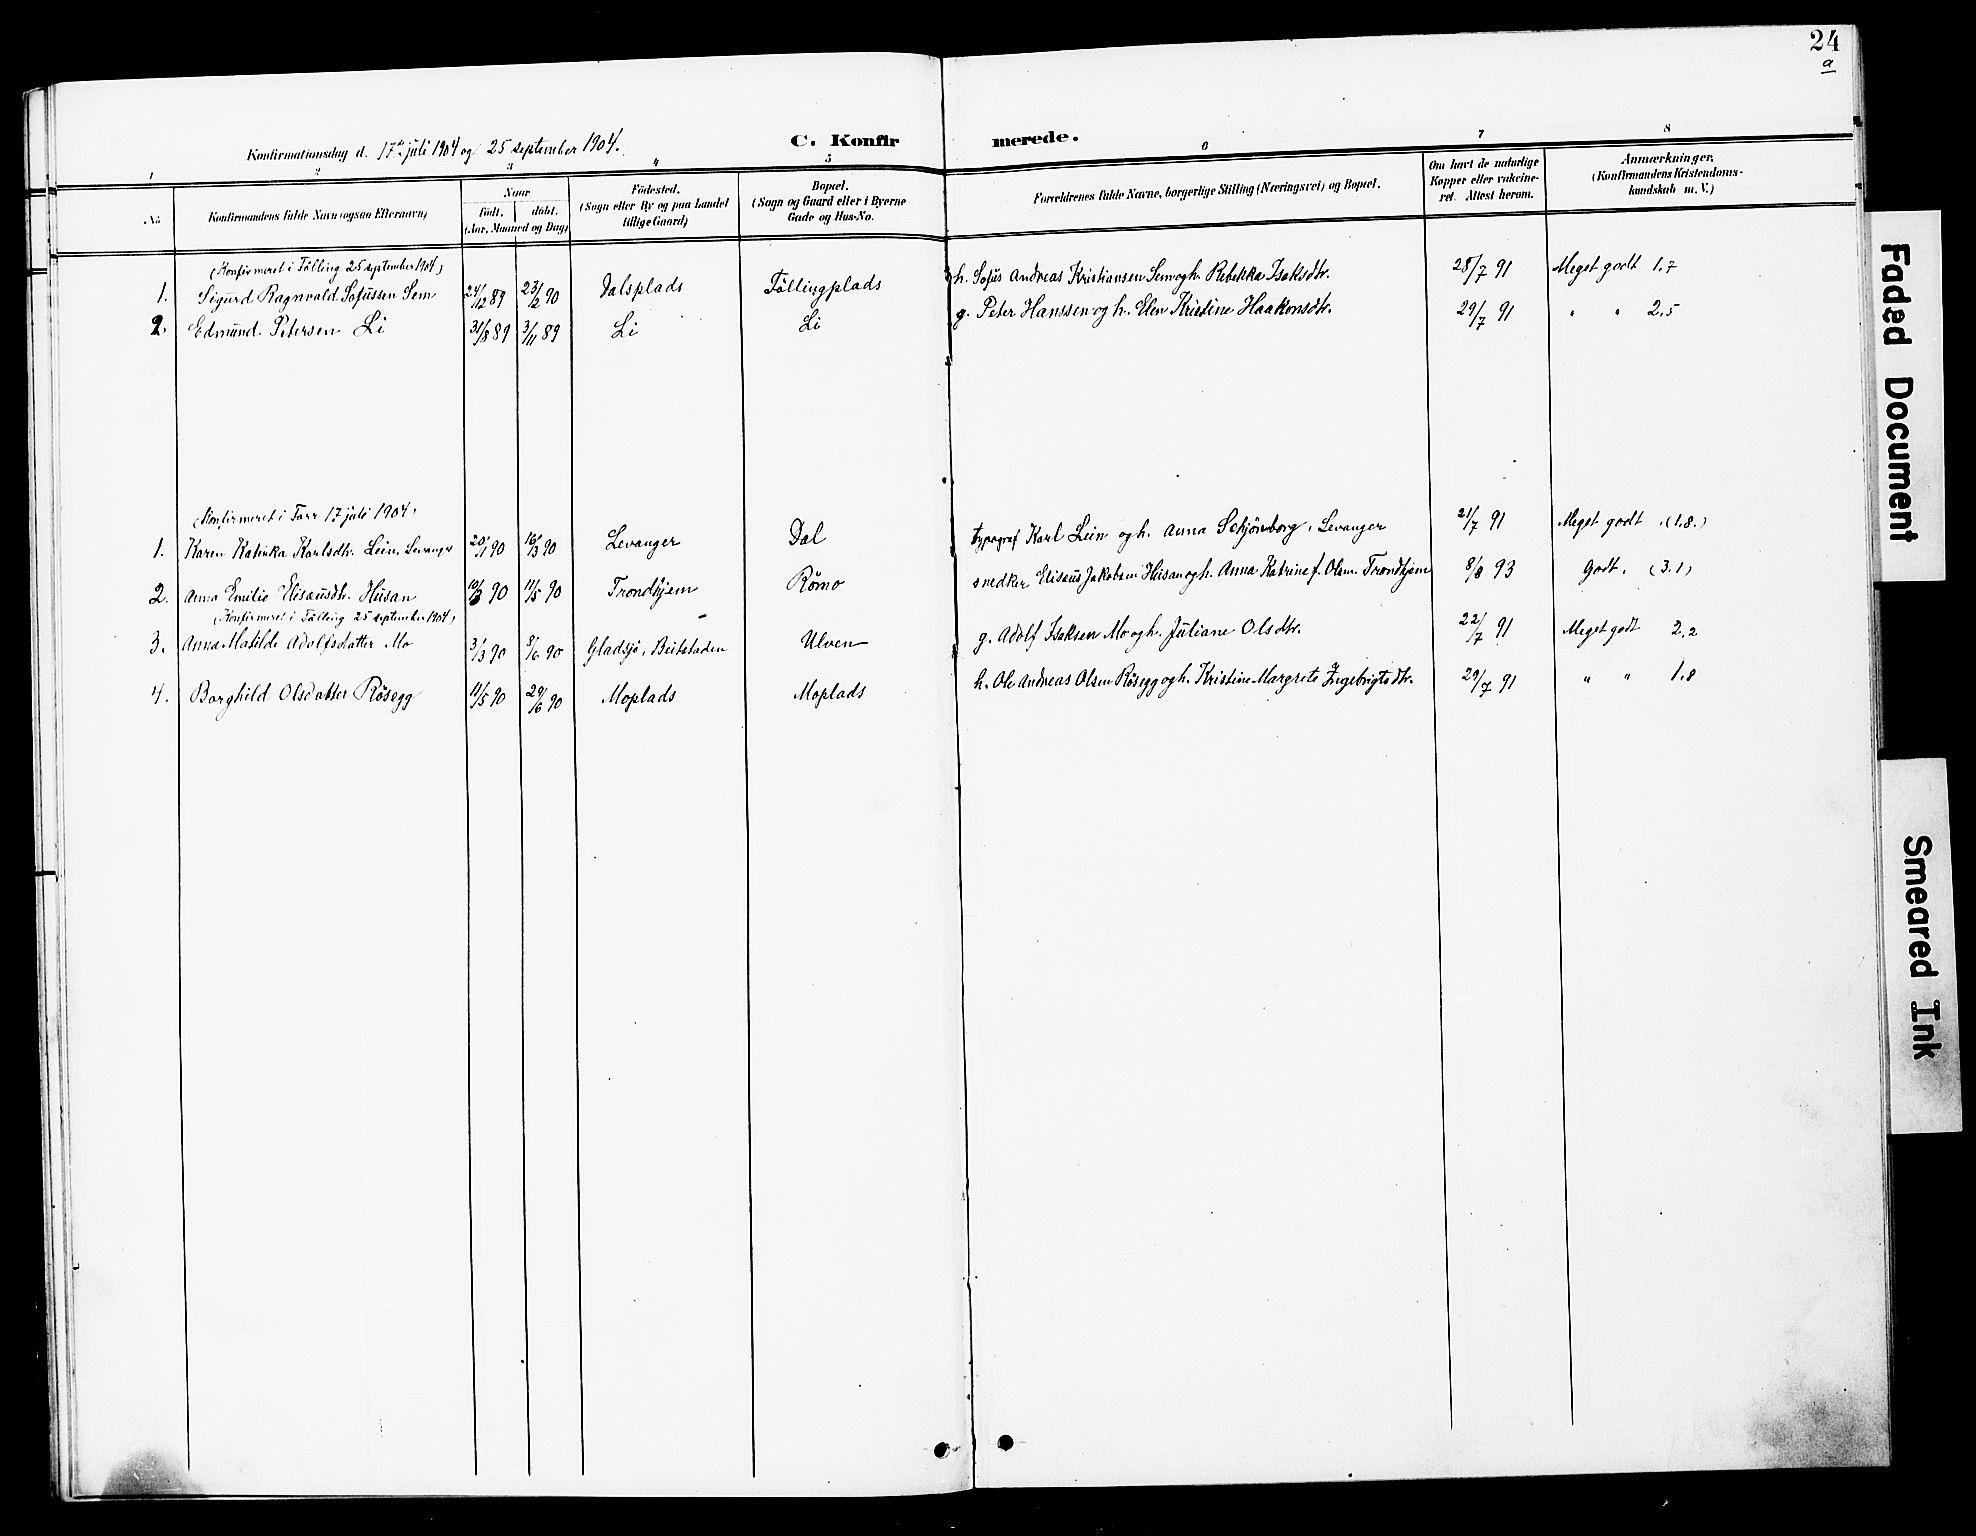 SAT, Ministerialprotokoller, klokkerbøker og fødselsregistre - Nord-Trøndelag, 748/L0464: Ministerialbok nr. 748A01, 1900-1908, s. 24a